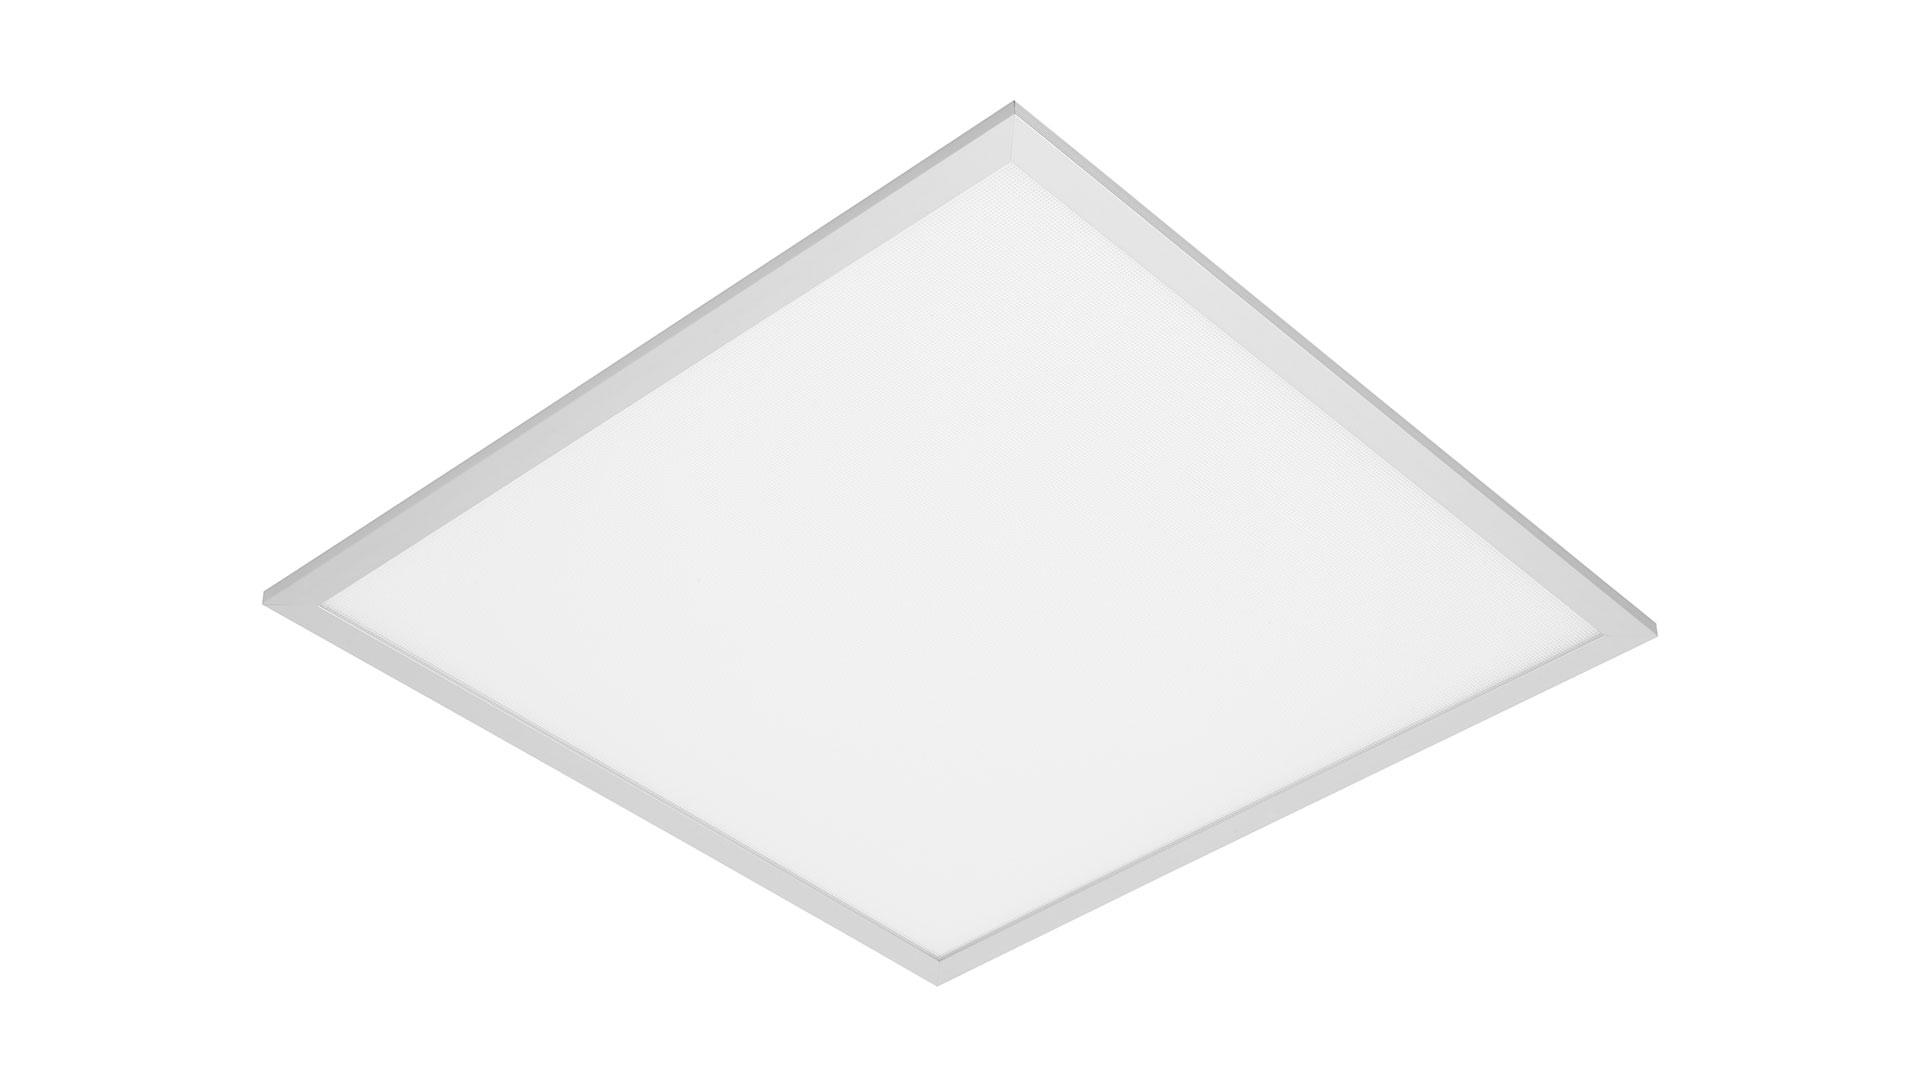 Lano PRO LED 42W, 4550lm, 840, microprisma, EVG, M625, weiß